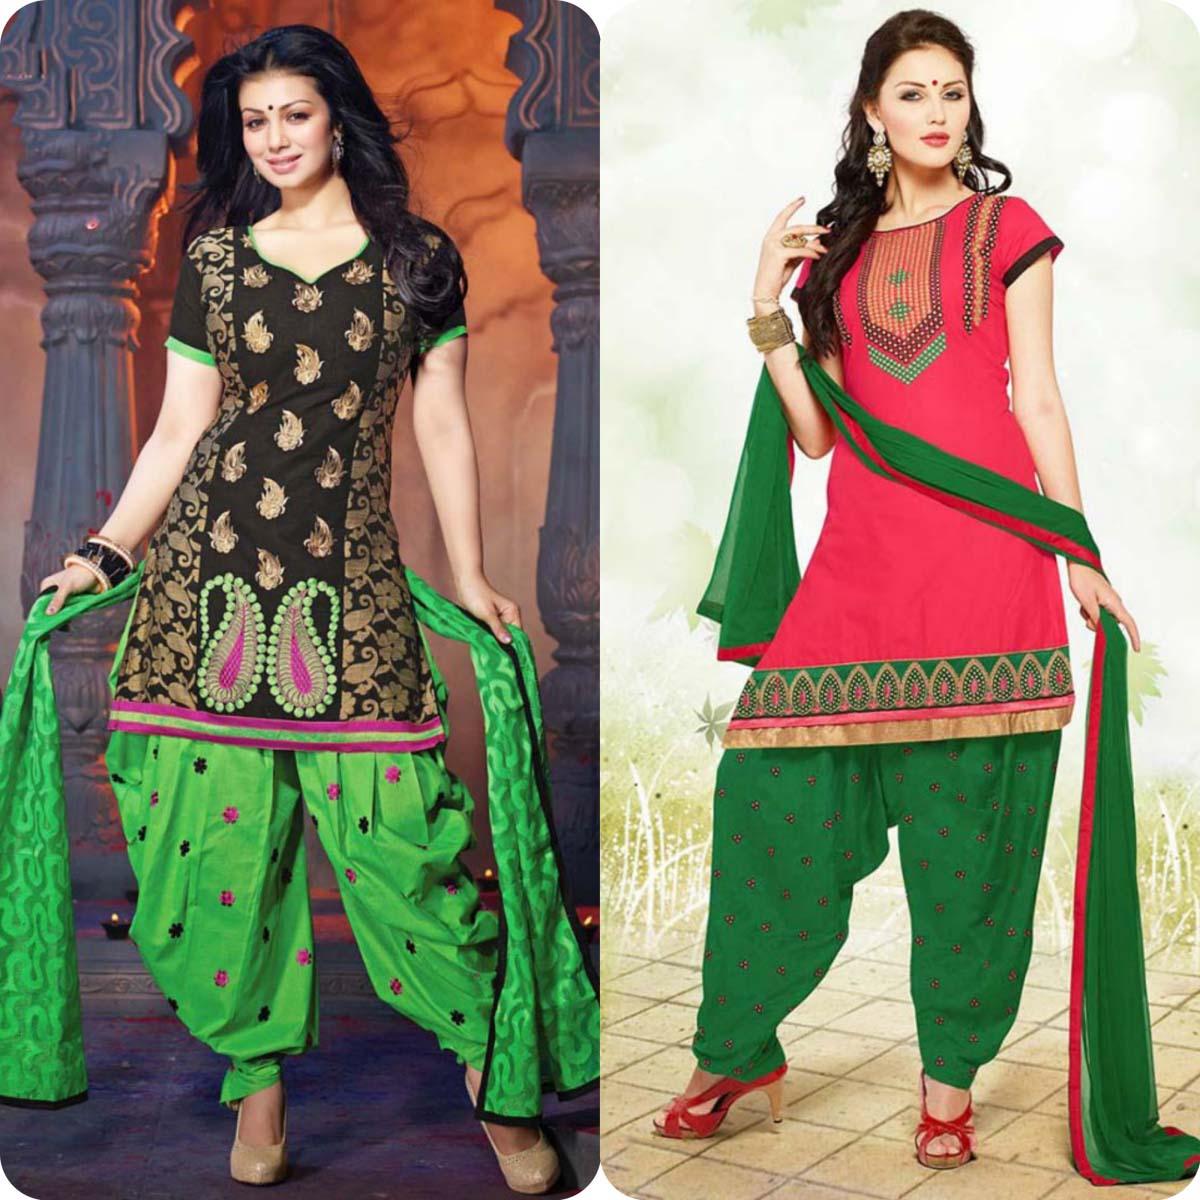 Latest Pakistani and Indian Patiala Shalwar Kameez Suits Designs (11)